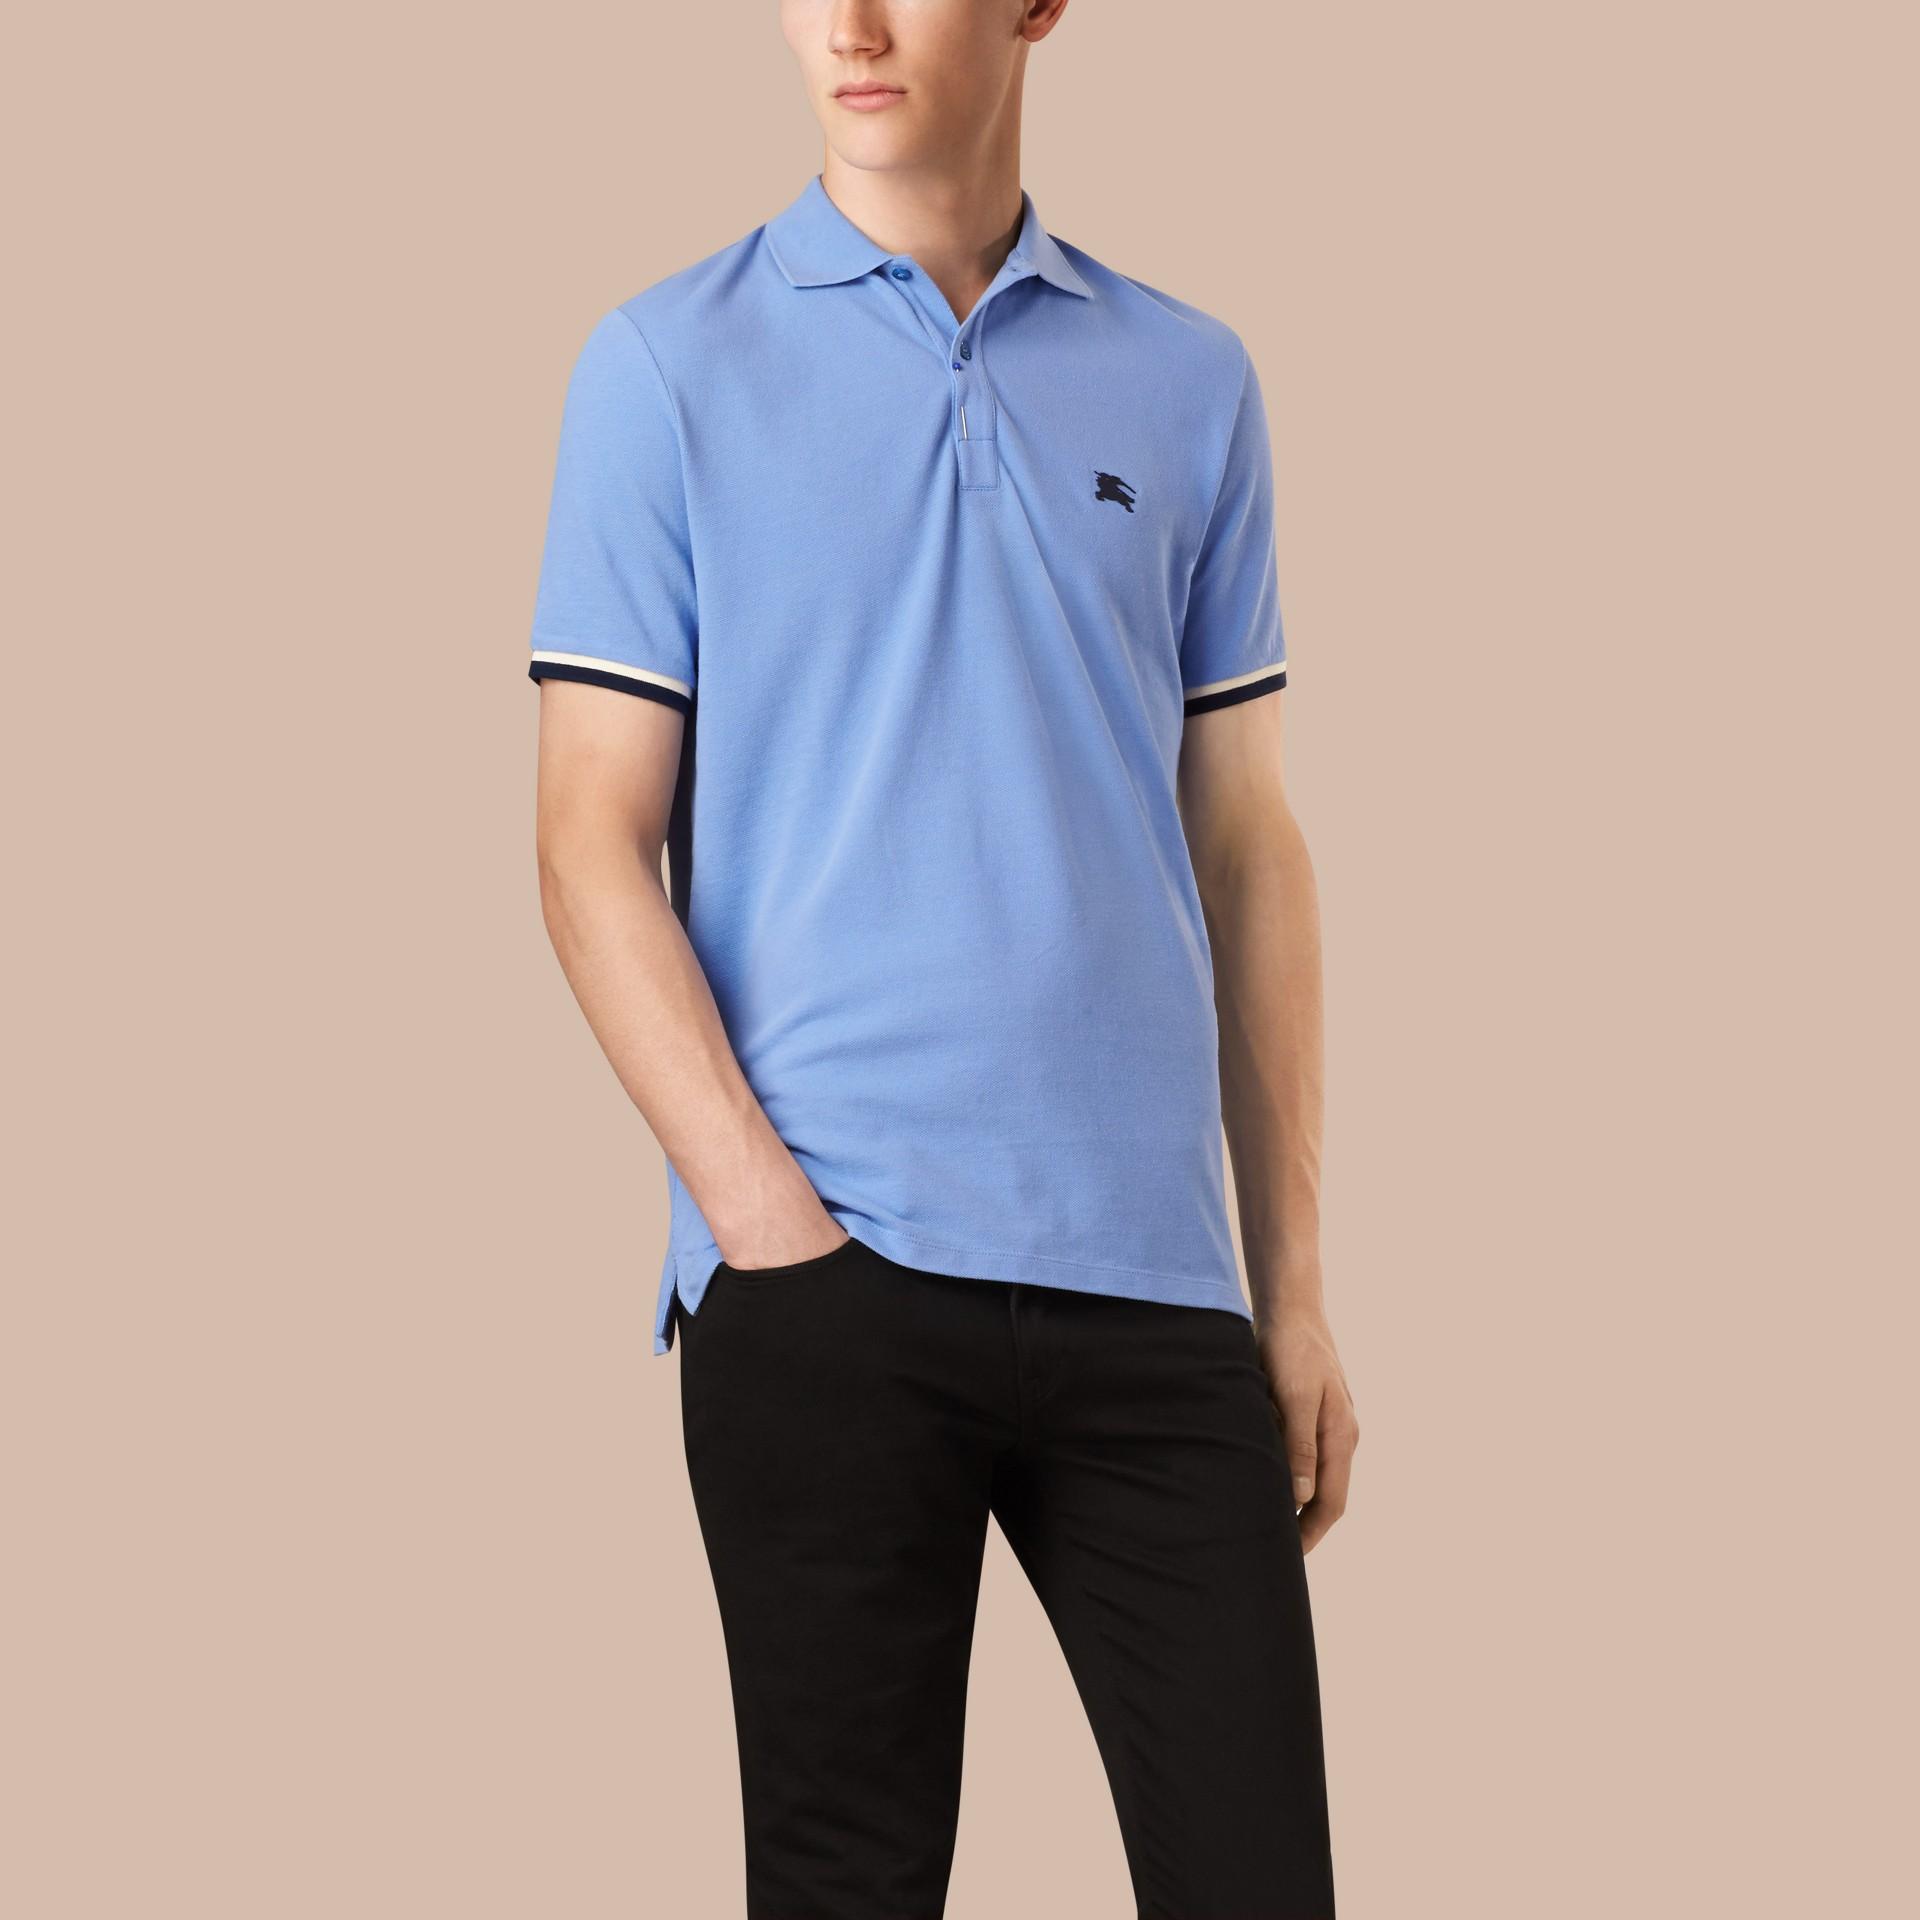 Hydrangea blue Contrast Cuff Cotton Piqué Polo Shirt Hydrangea Blue - gallery image 1